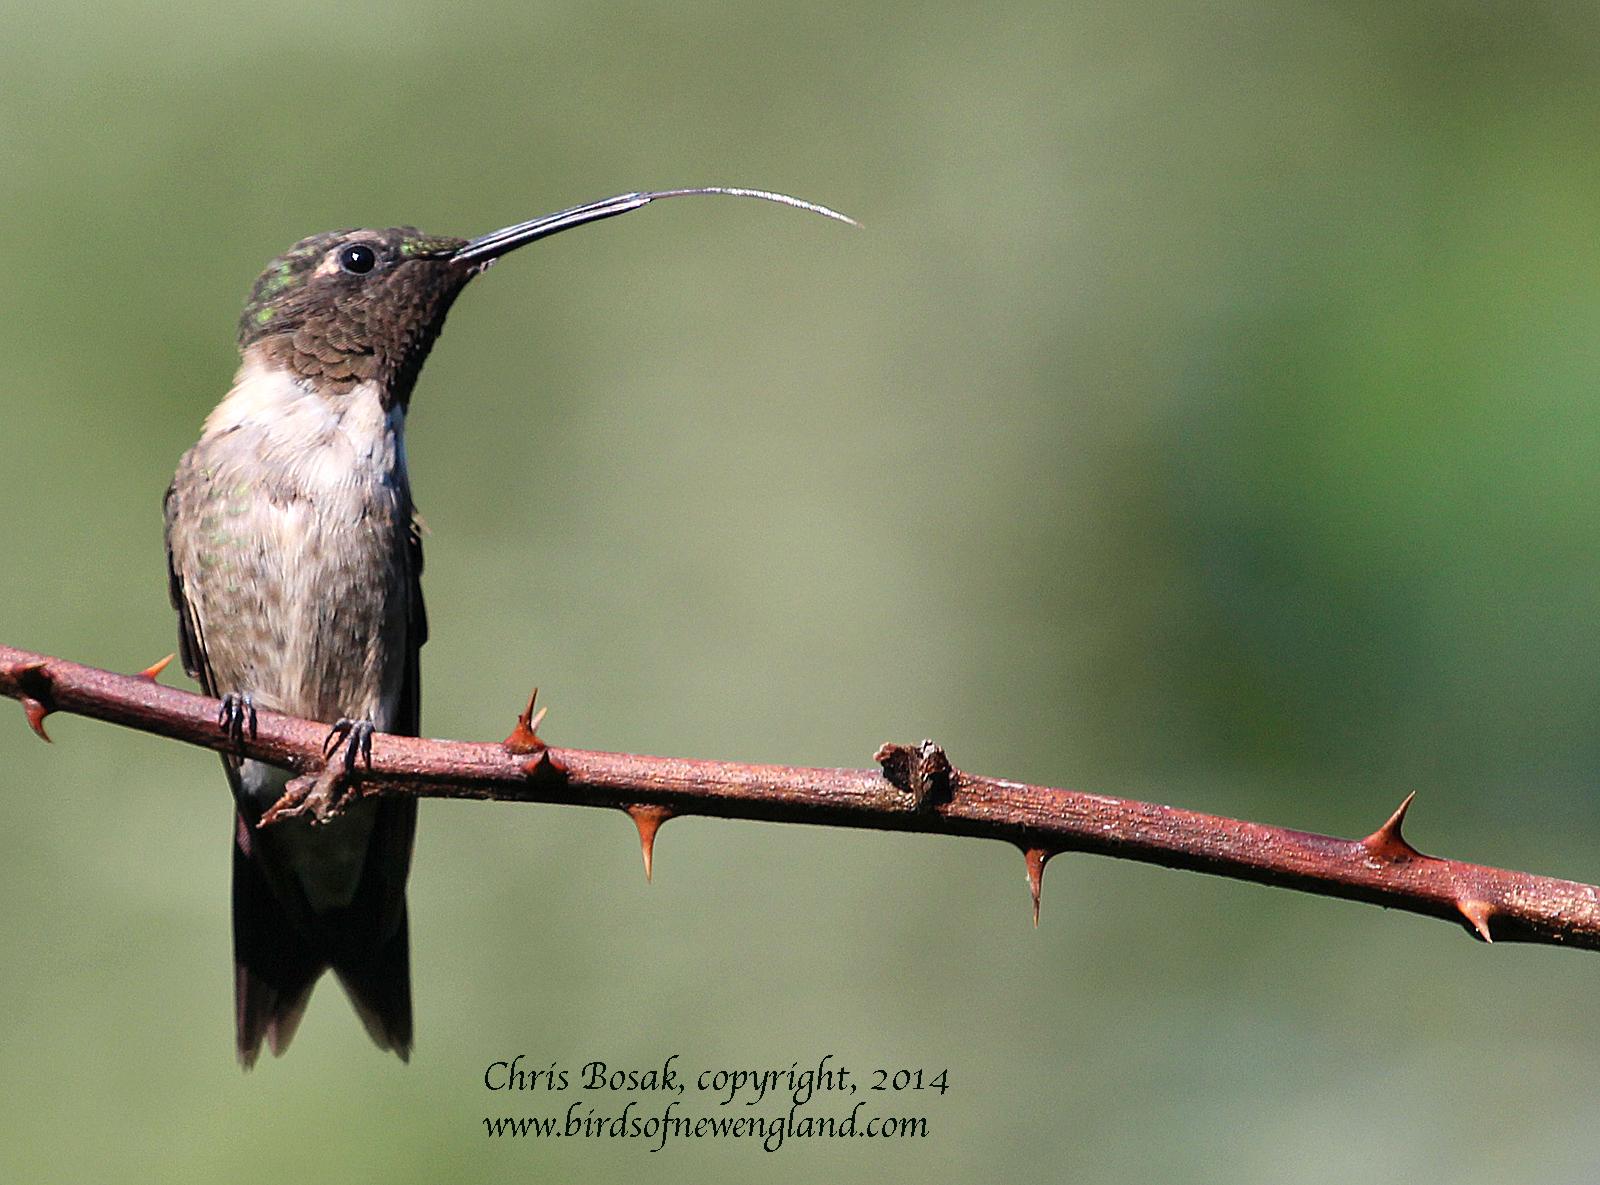 Ruby-Throated Hummingbird, ki pije iz jagodičjih ptic New Englandcoma-1943